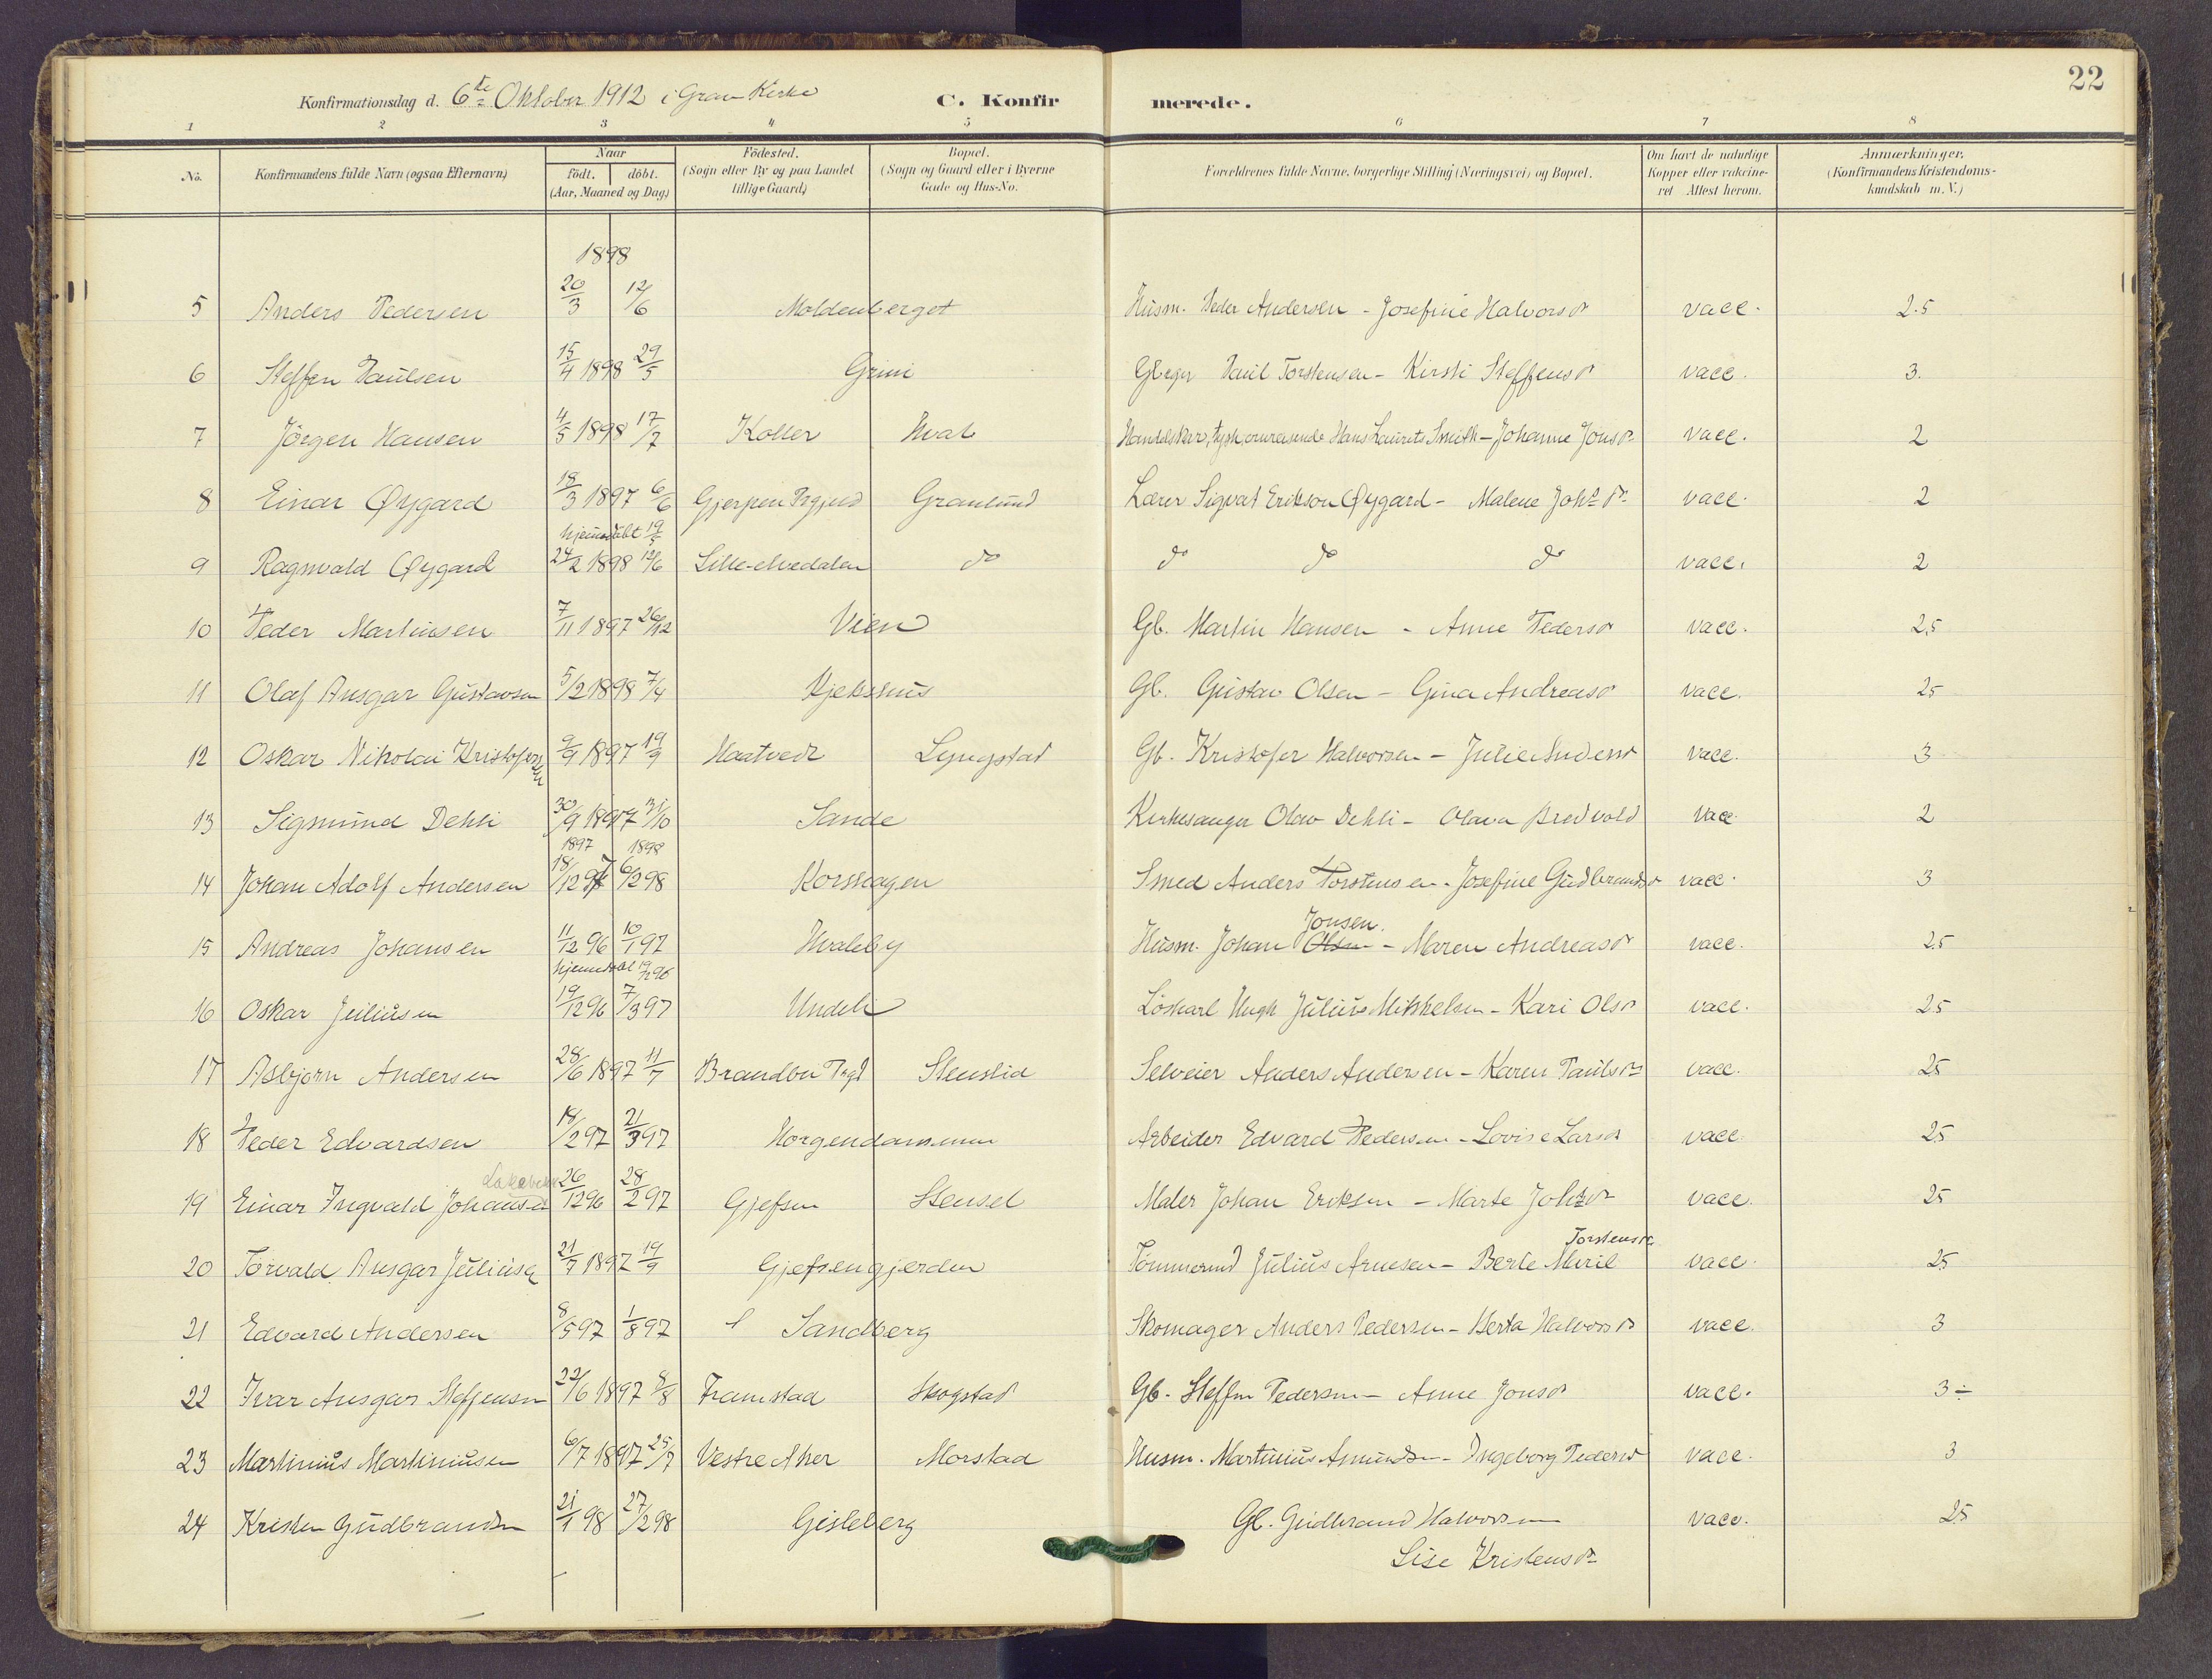 SAH, Gran prestekontor, Ministerialbok nr. 22, 1908-1918, s. 22